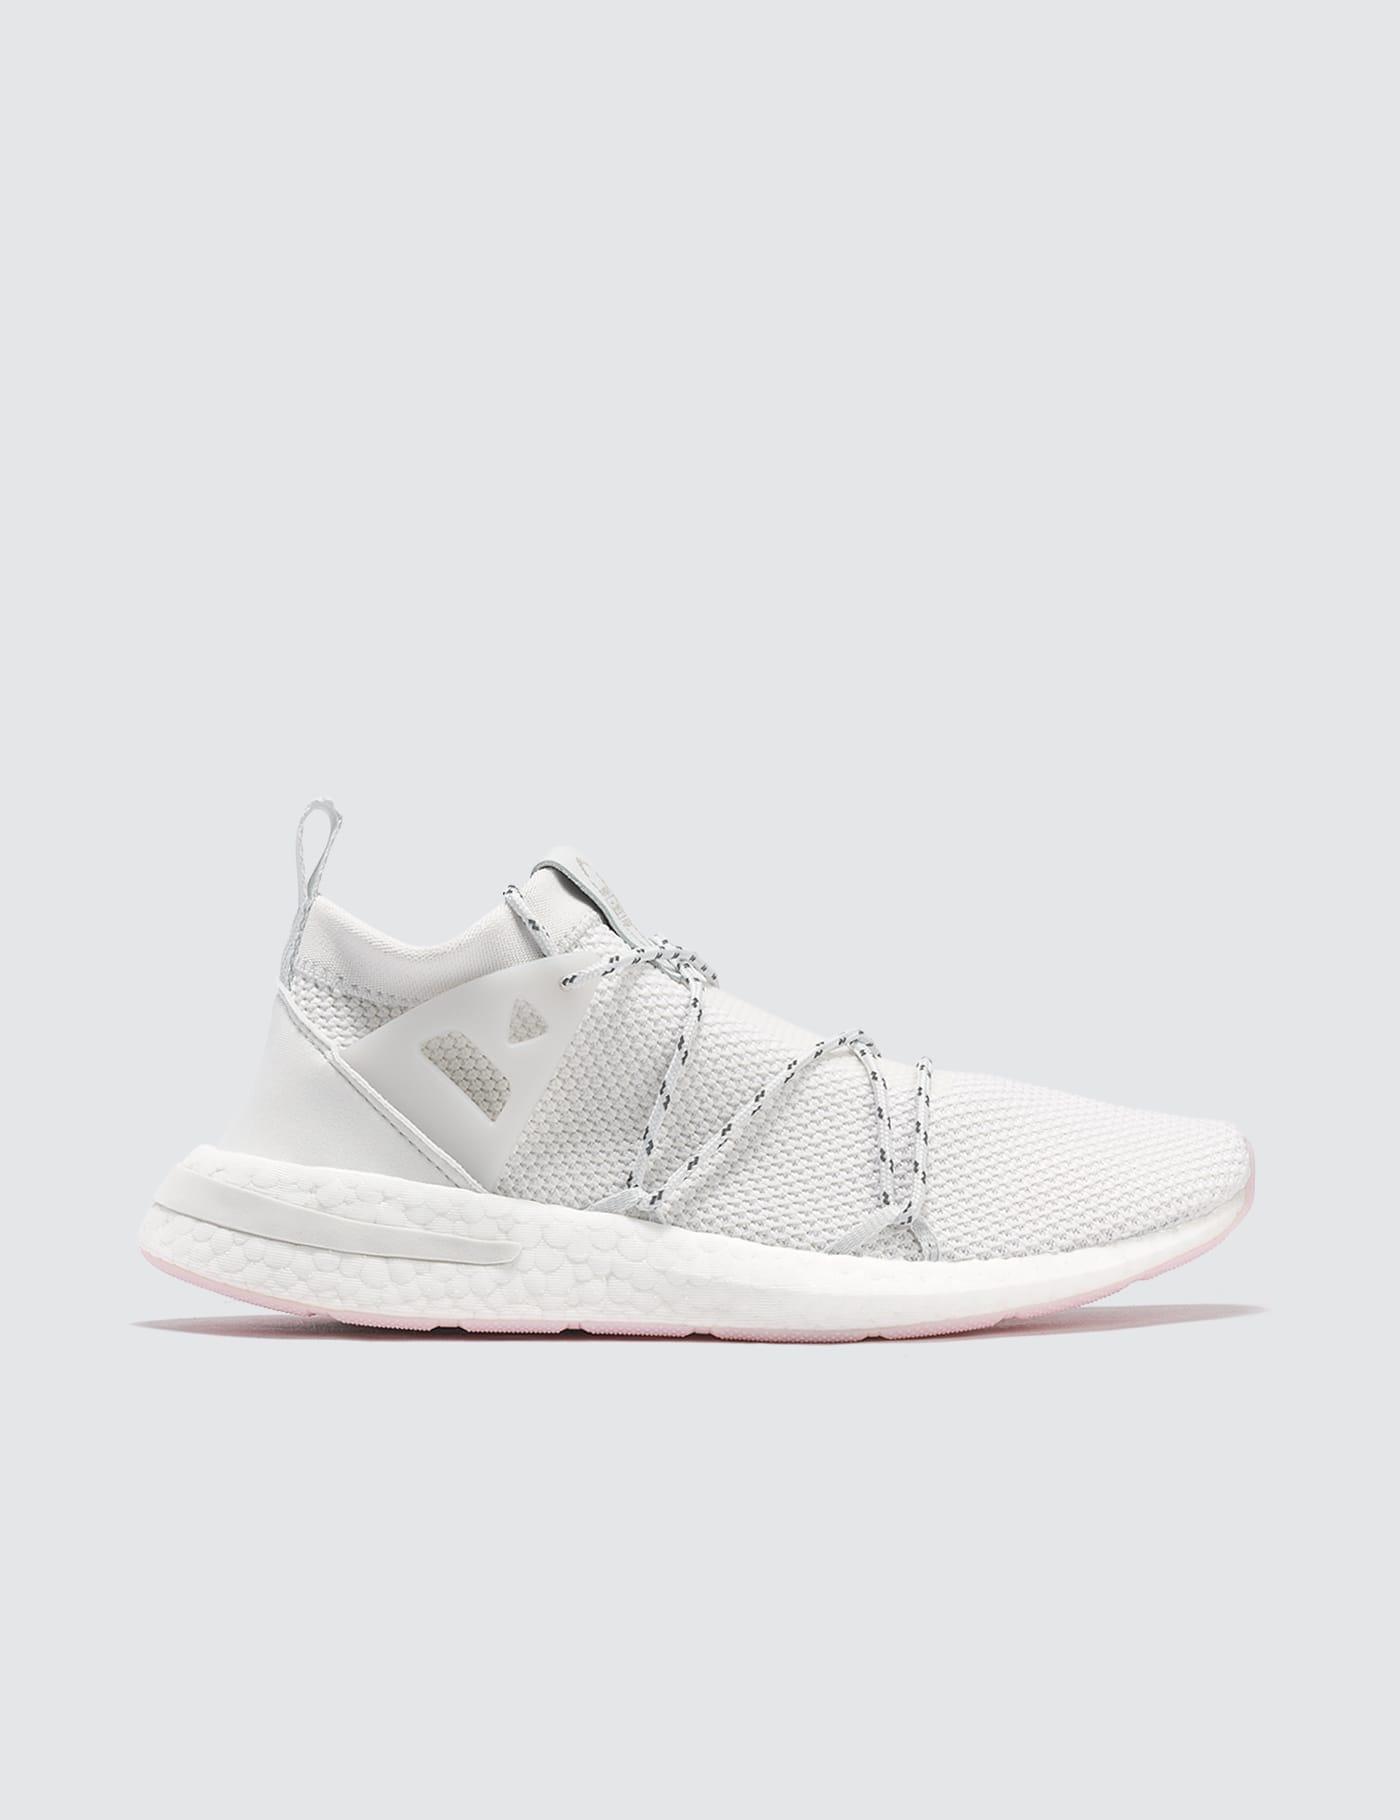 Adidas Originals - Arkyn Knit W | HBX